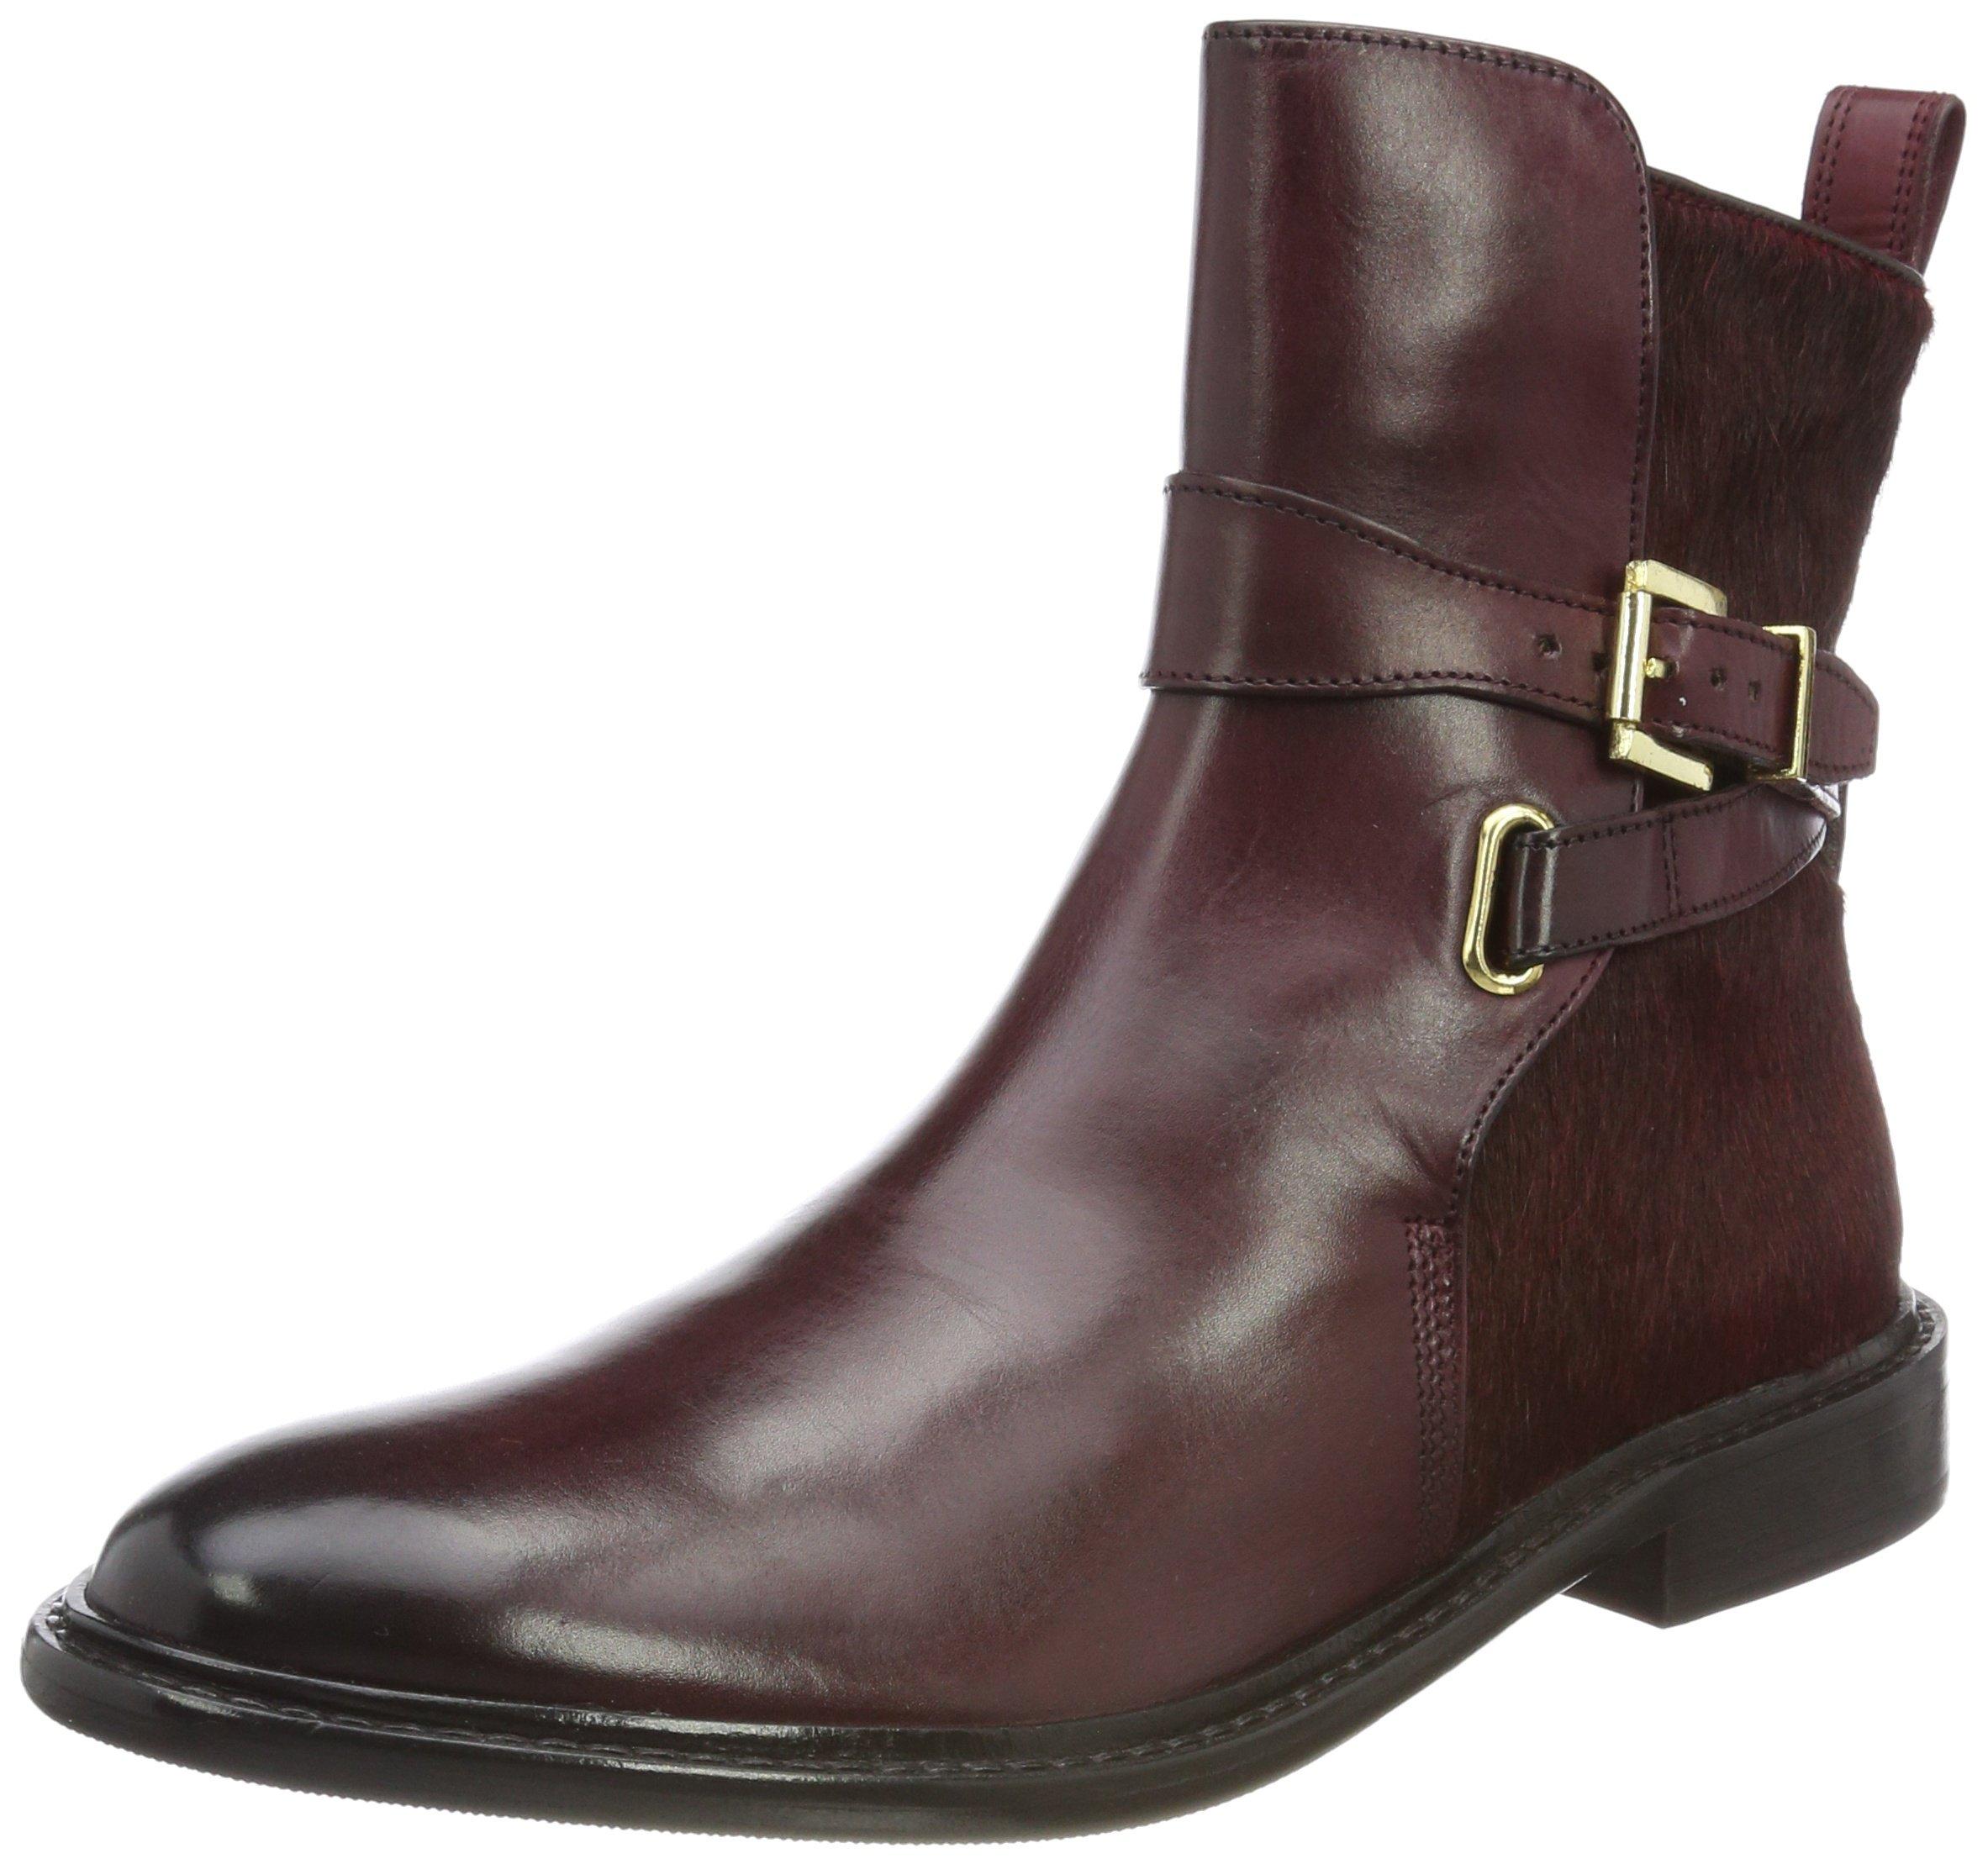 hrs hairon Burgundy Strap Hamilton Eu FemmeMarron Thick40 Melvinamp; Sole 64Chelsea Boots New Sally Crust wXTZOkuPi